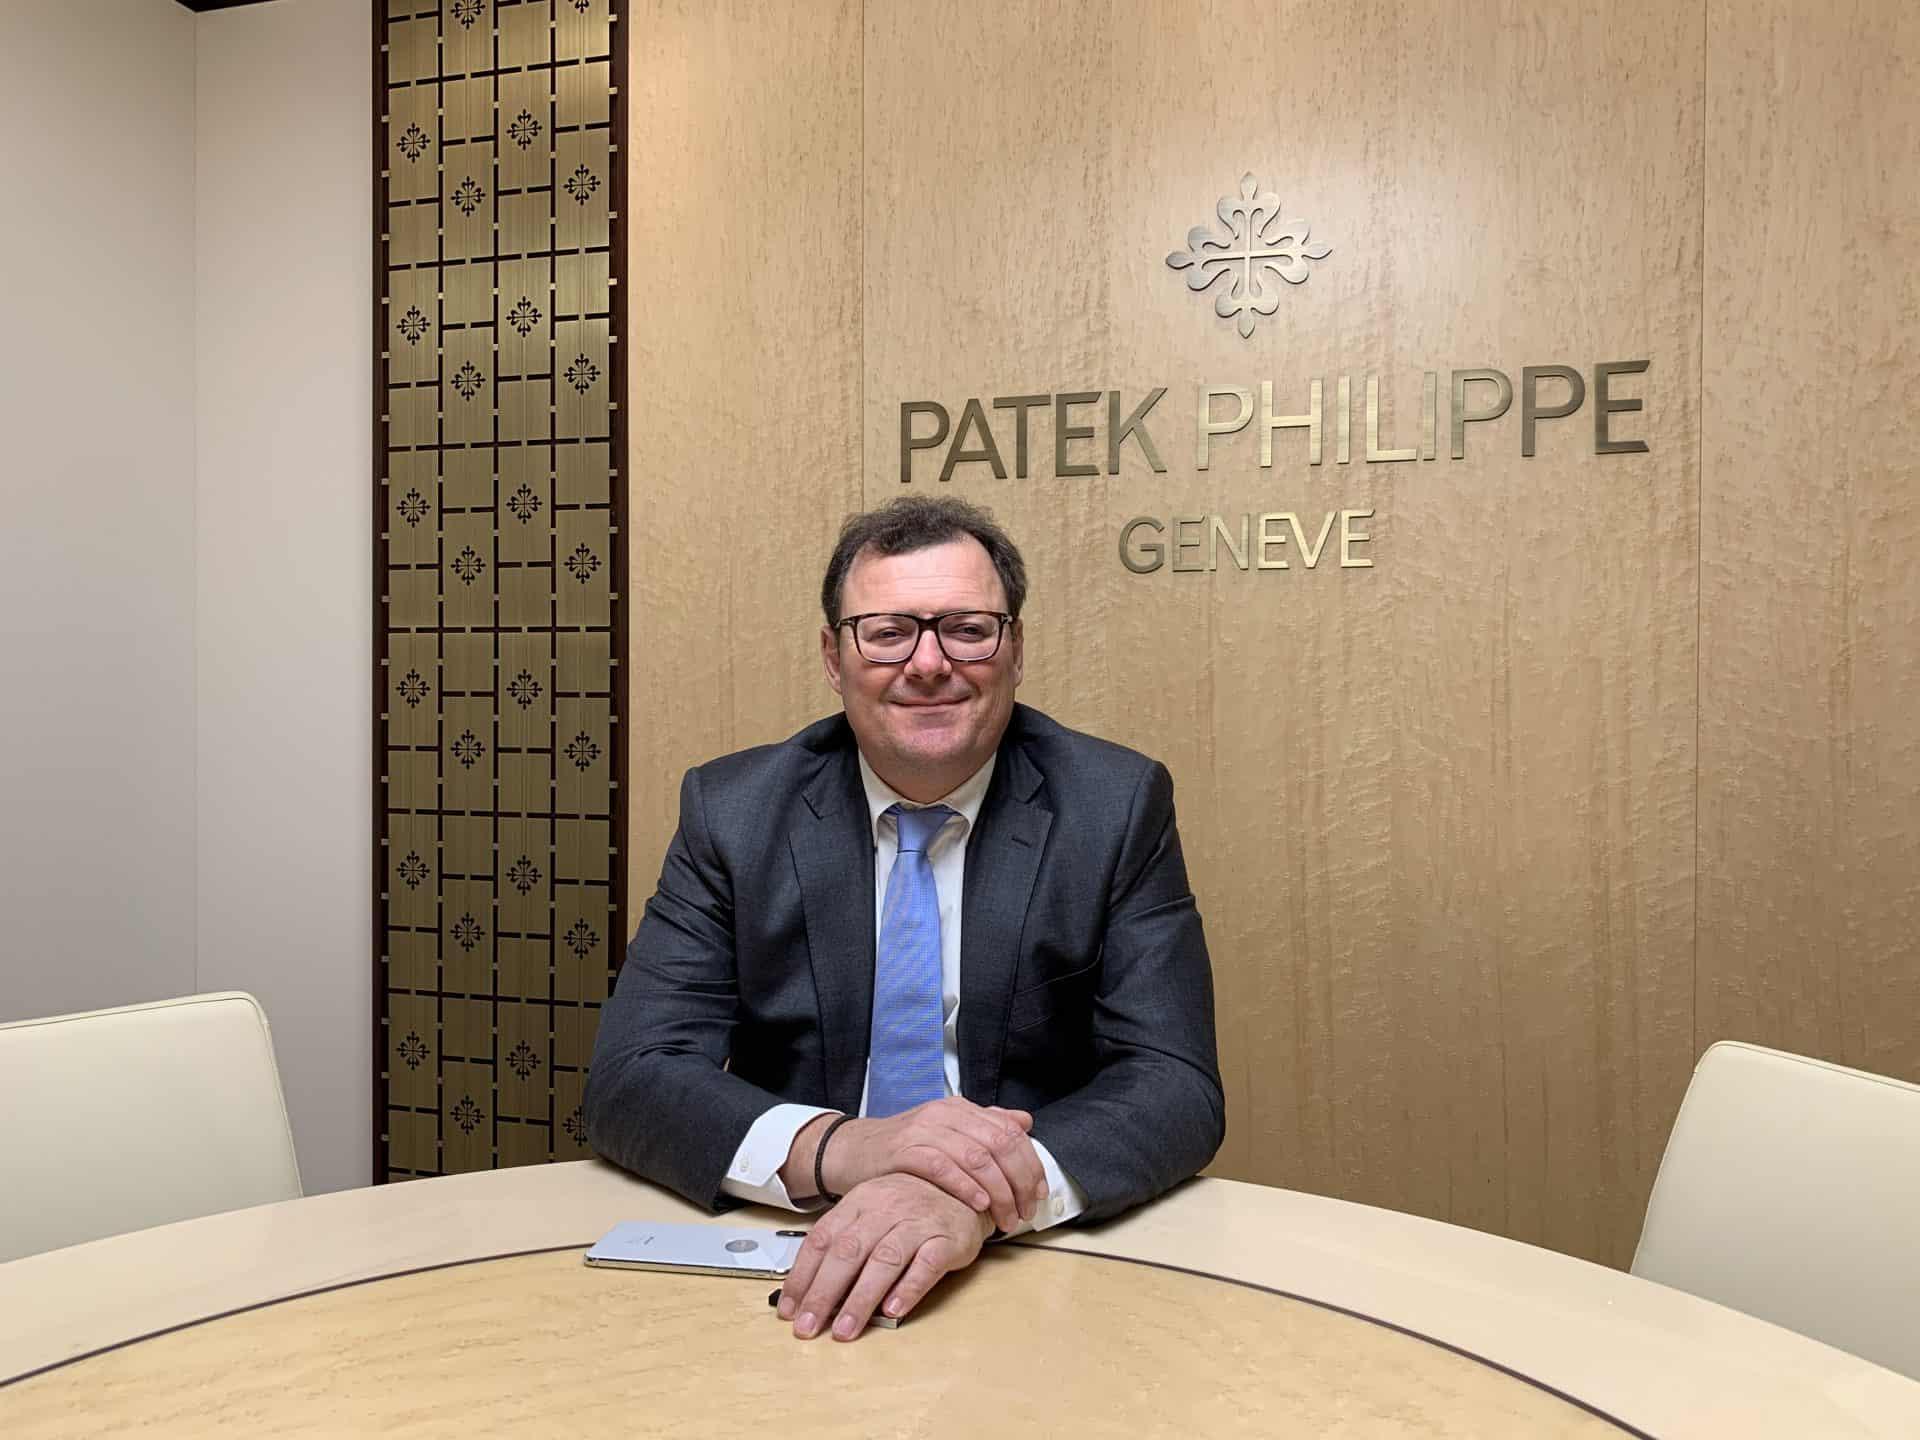 Patek Philipppe Thierry Stern